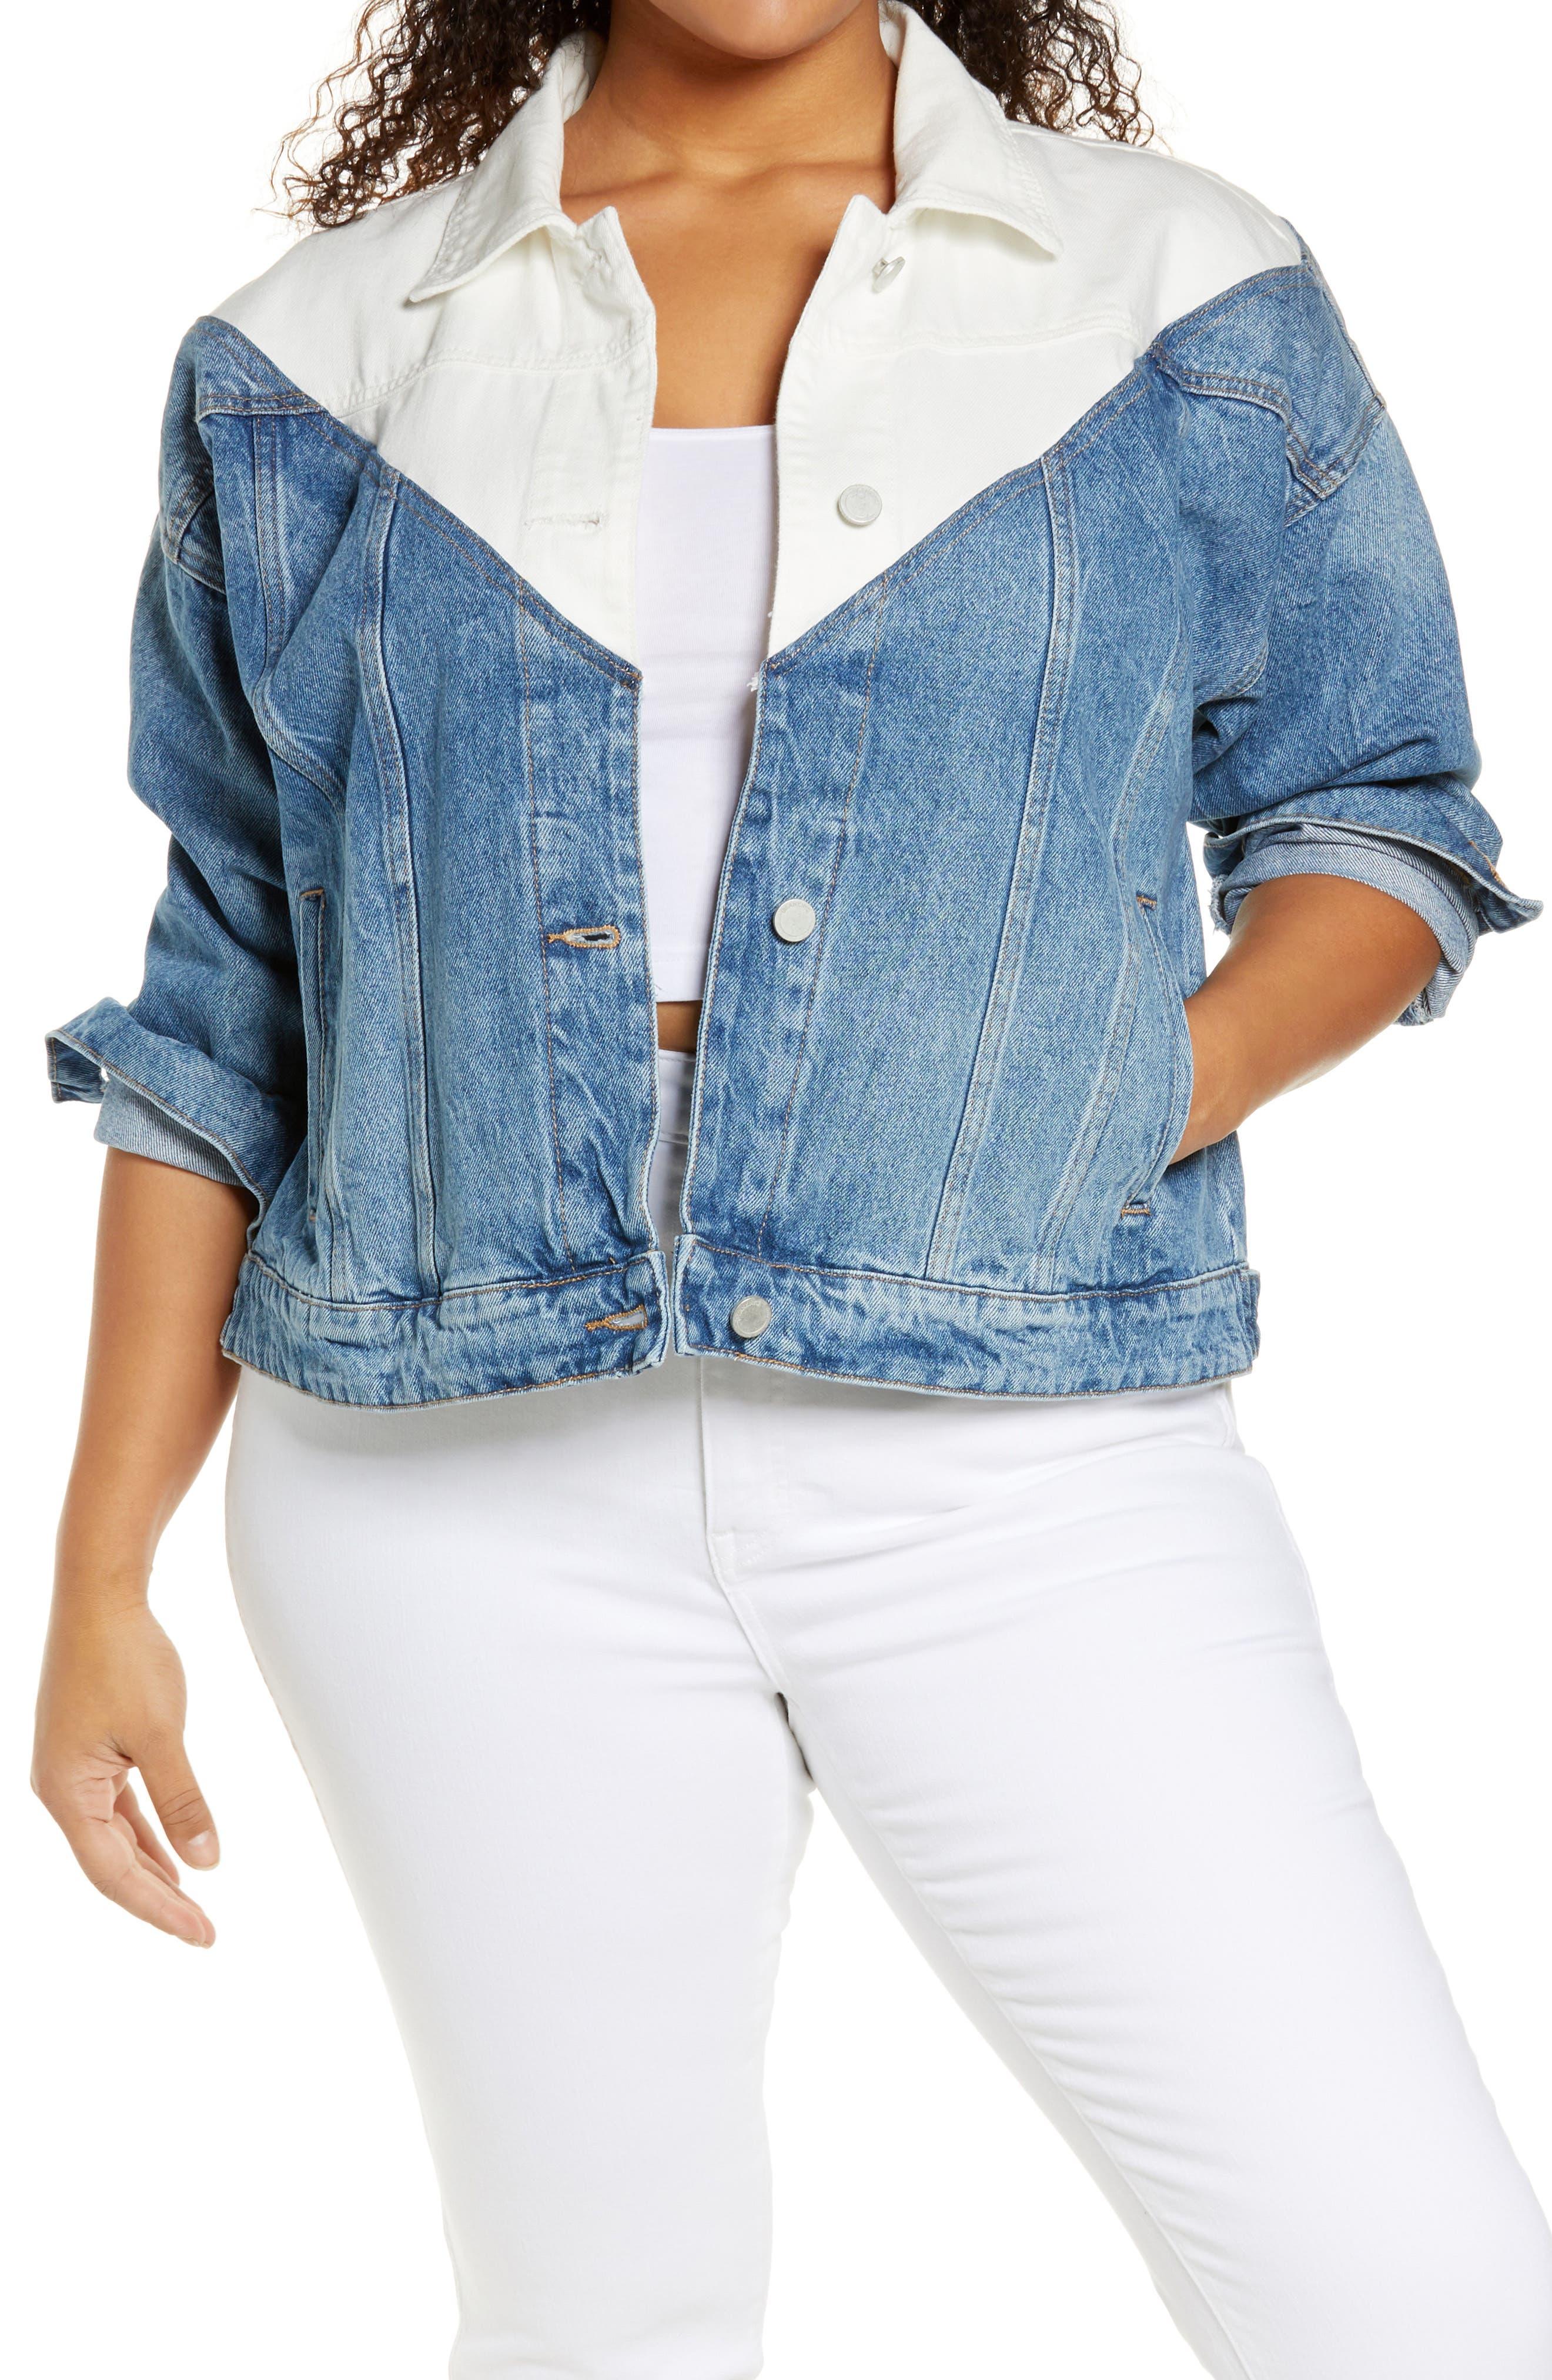 Plus Size Women's Blanknyc Patchwork Denim Trucker Jacket, Size 2X - Blue